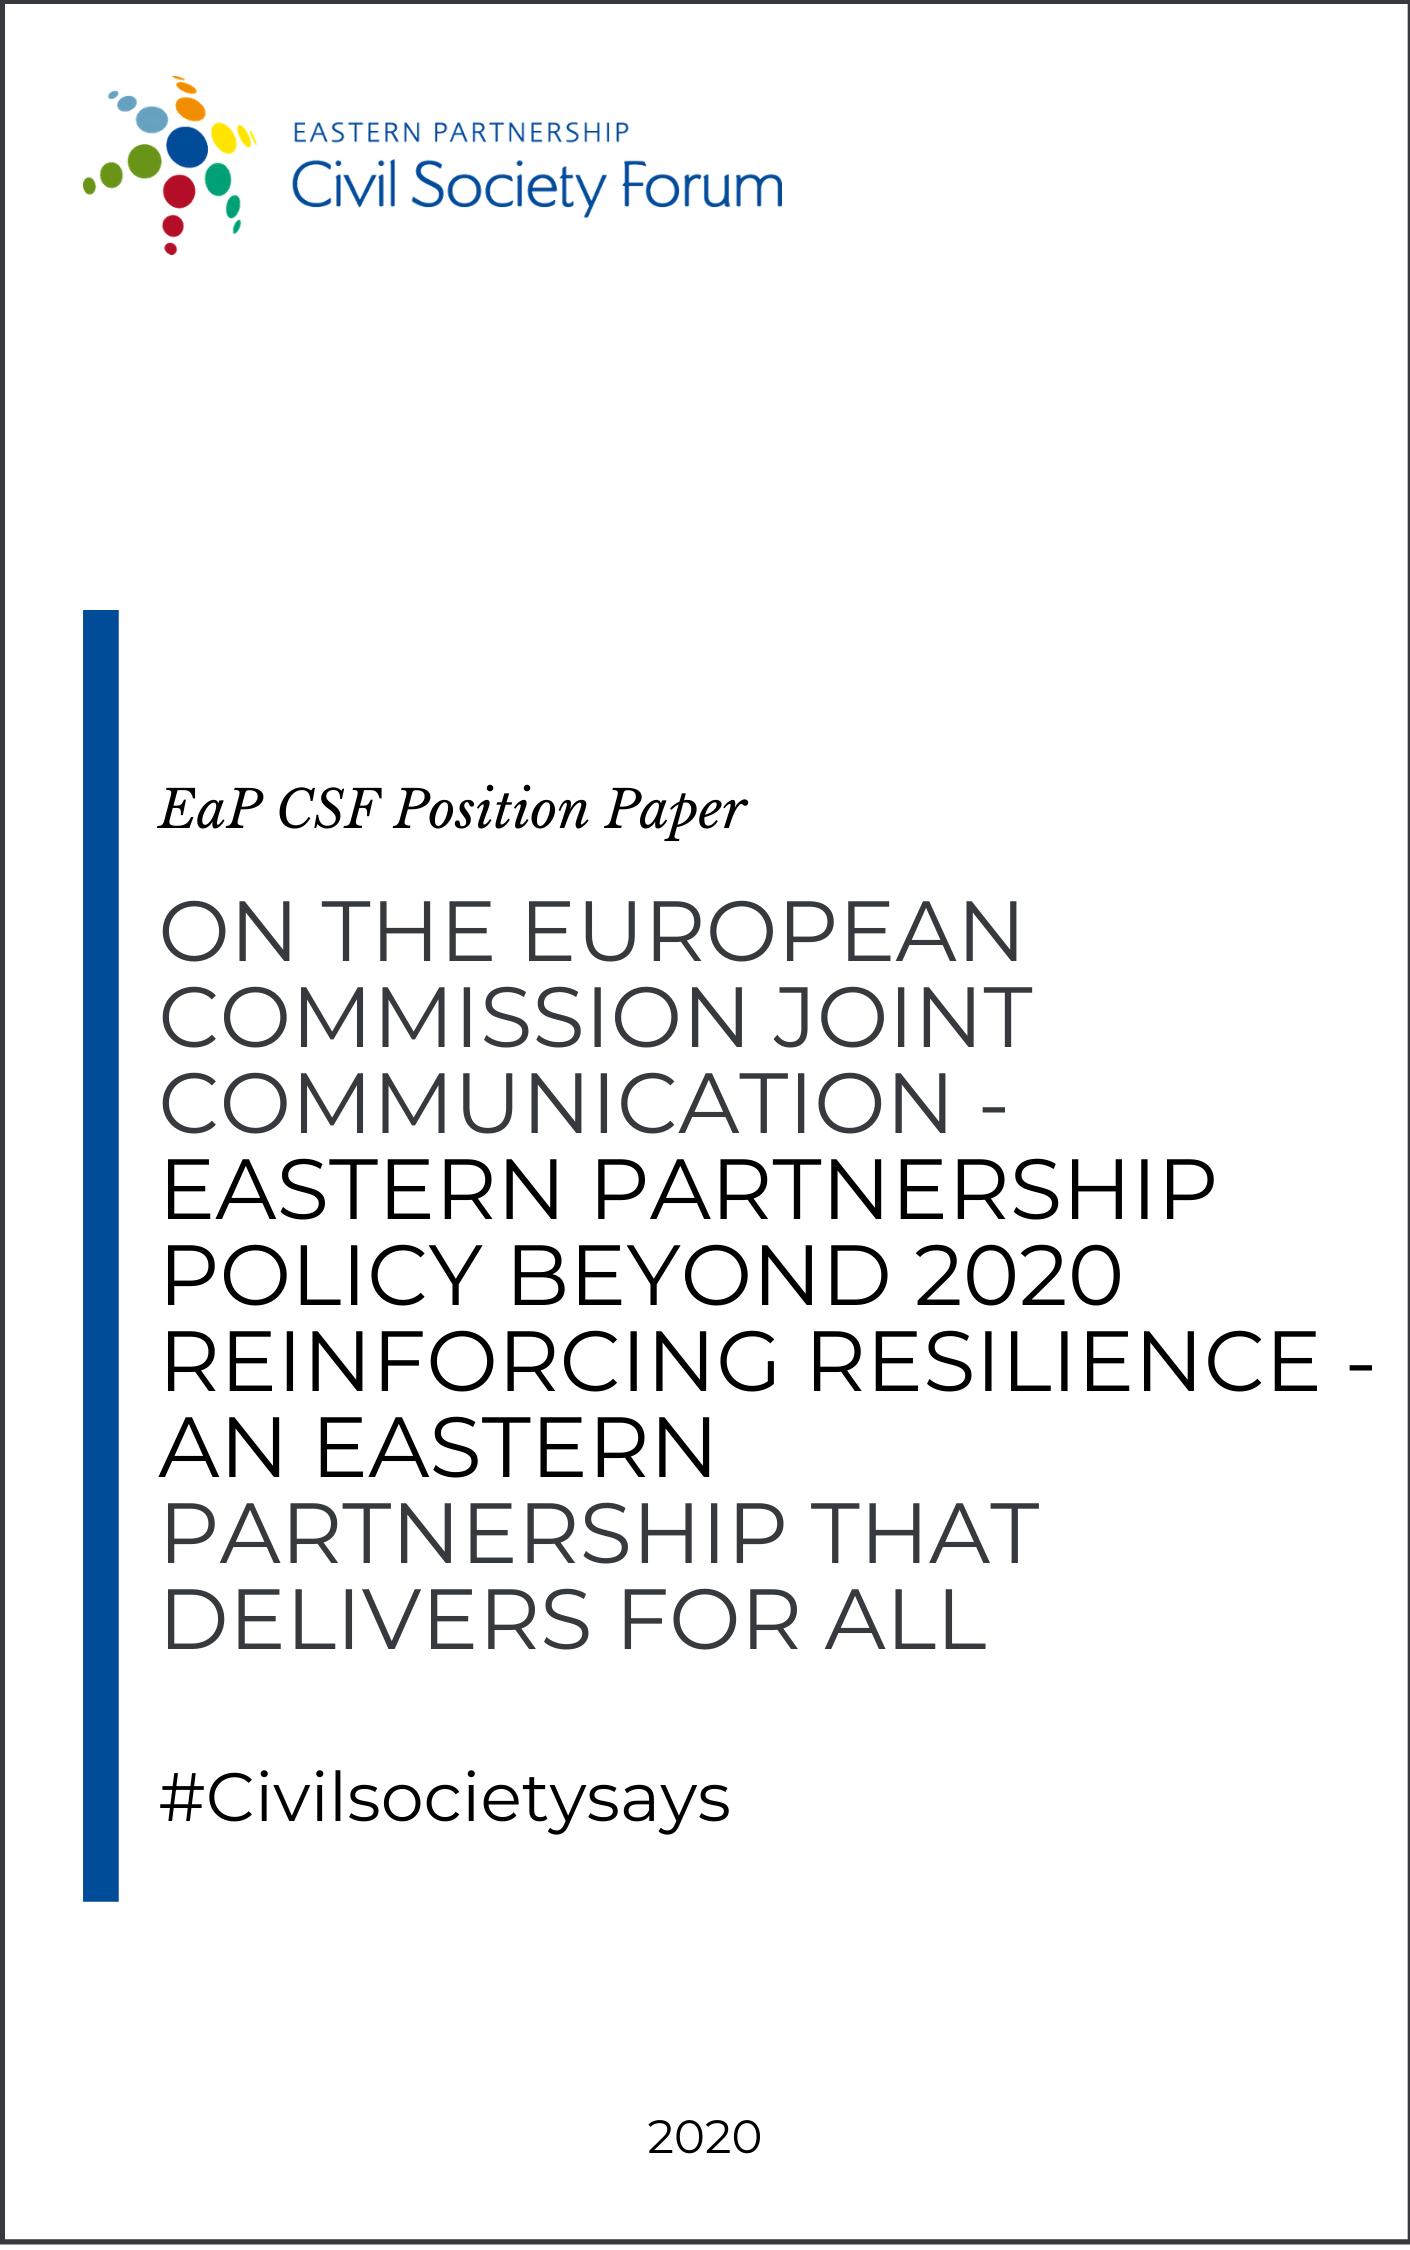 Response to EC Communication 2020